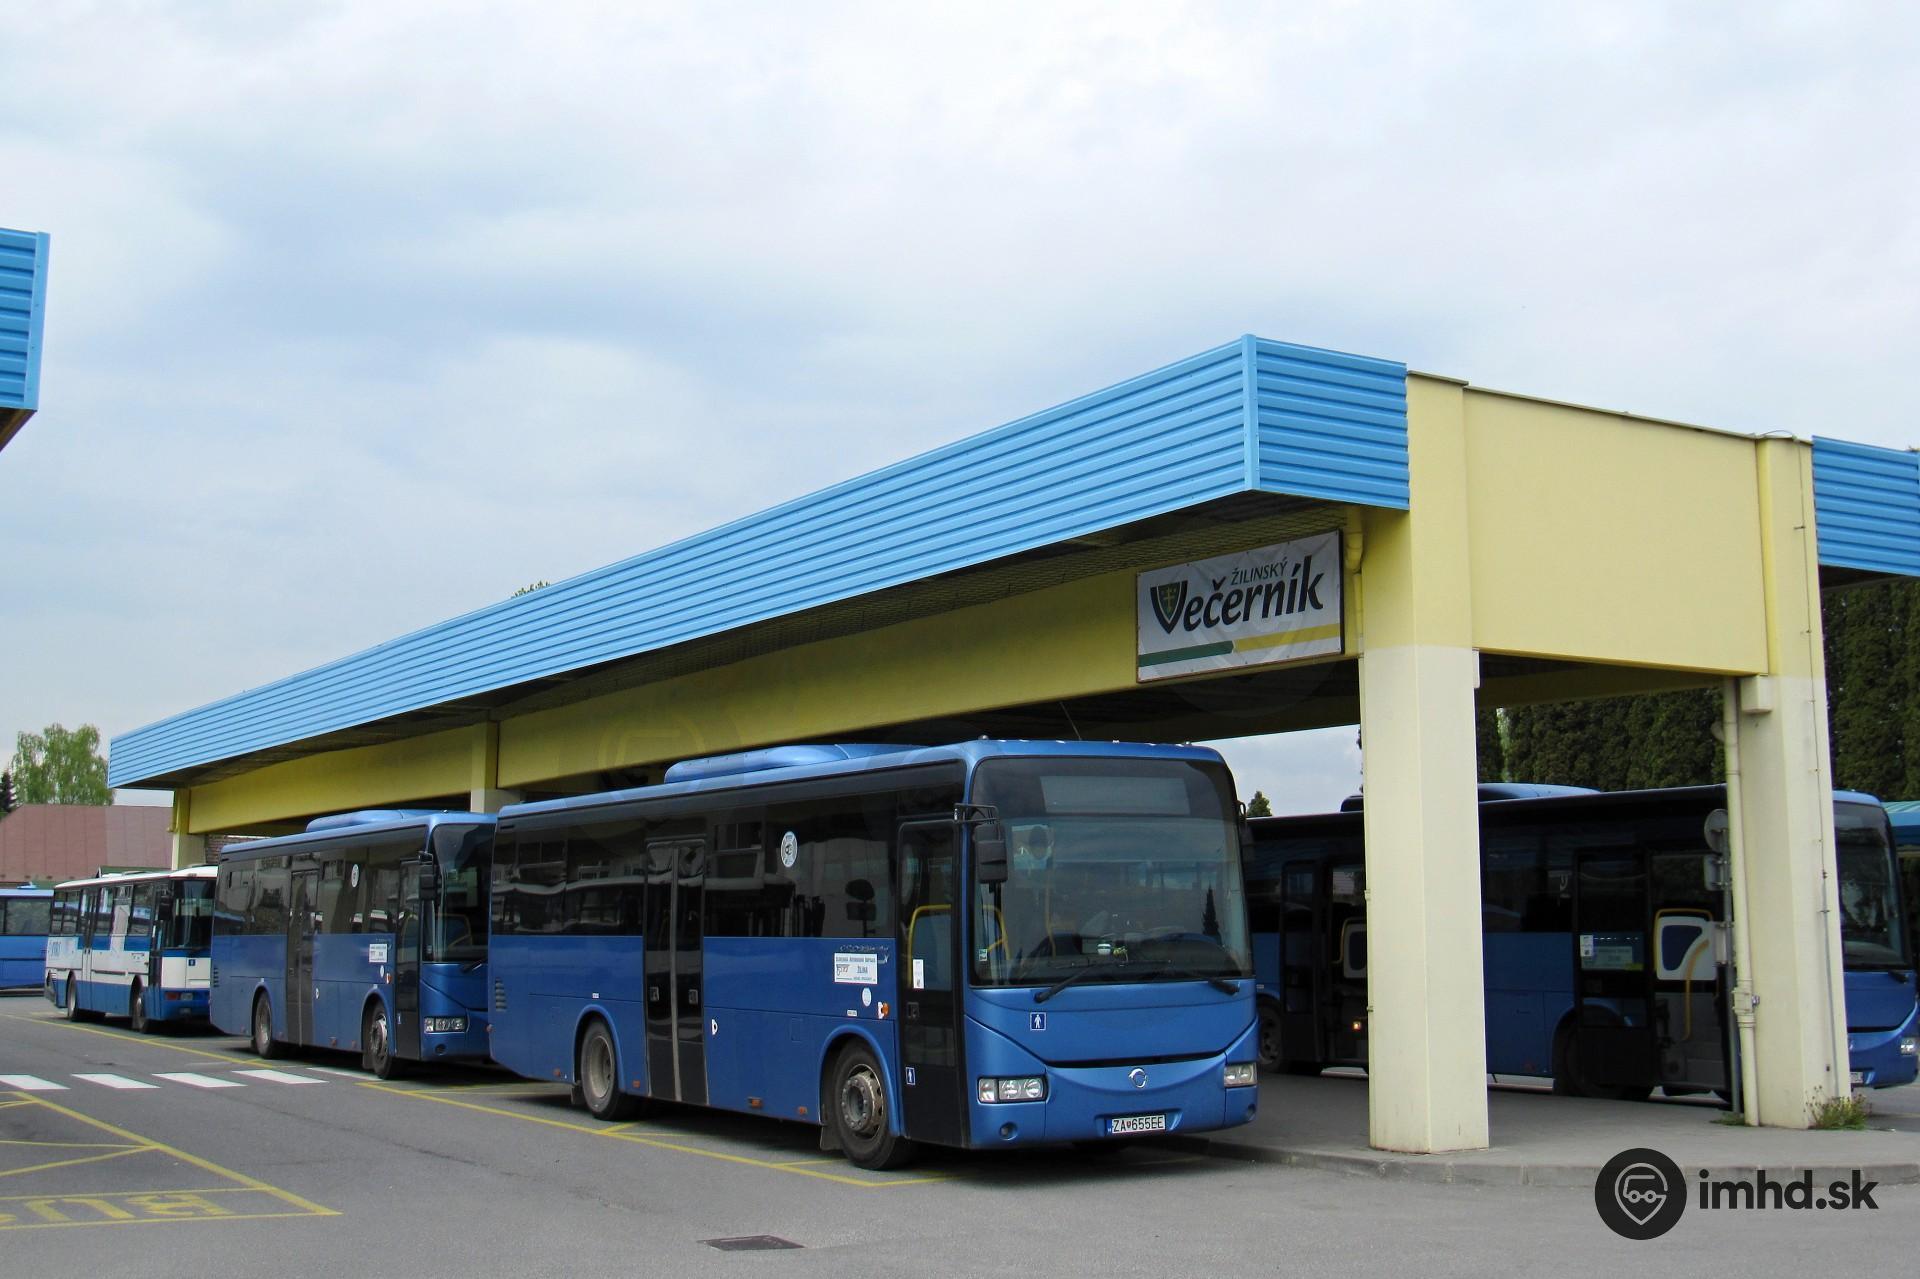 d933aa390 Autobusy SAD Žilina na autobusovej stanici v Bytči • imhd.sk Banská ...